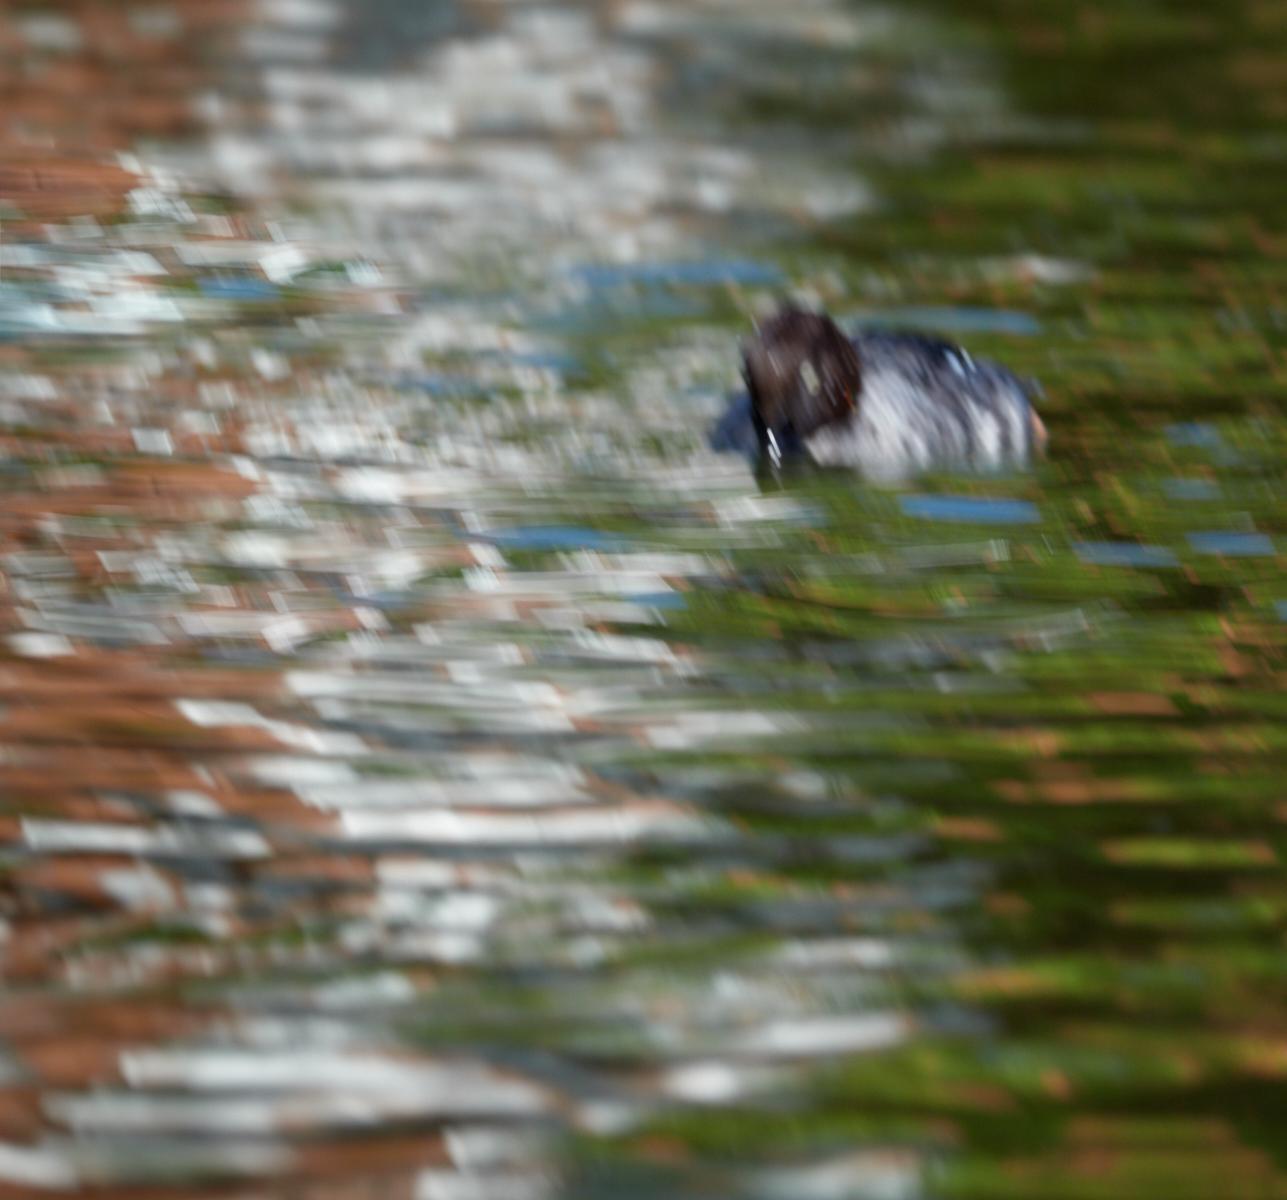 Duck focus1600x1200 sRGB.jpg